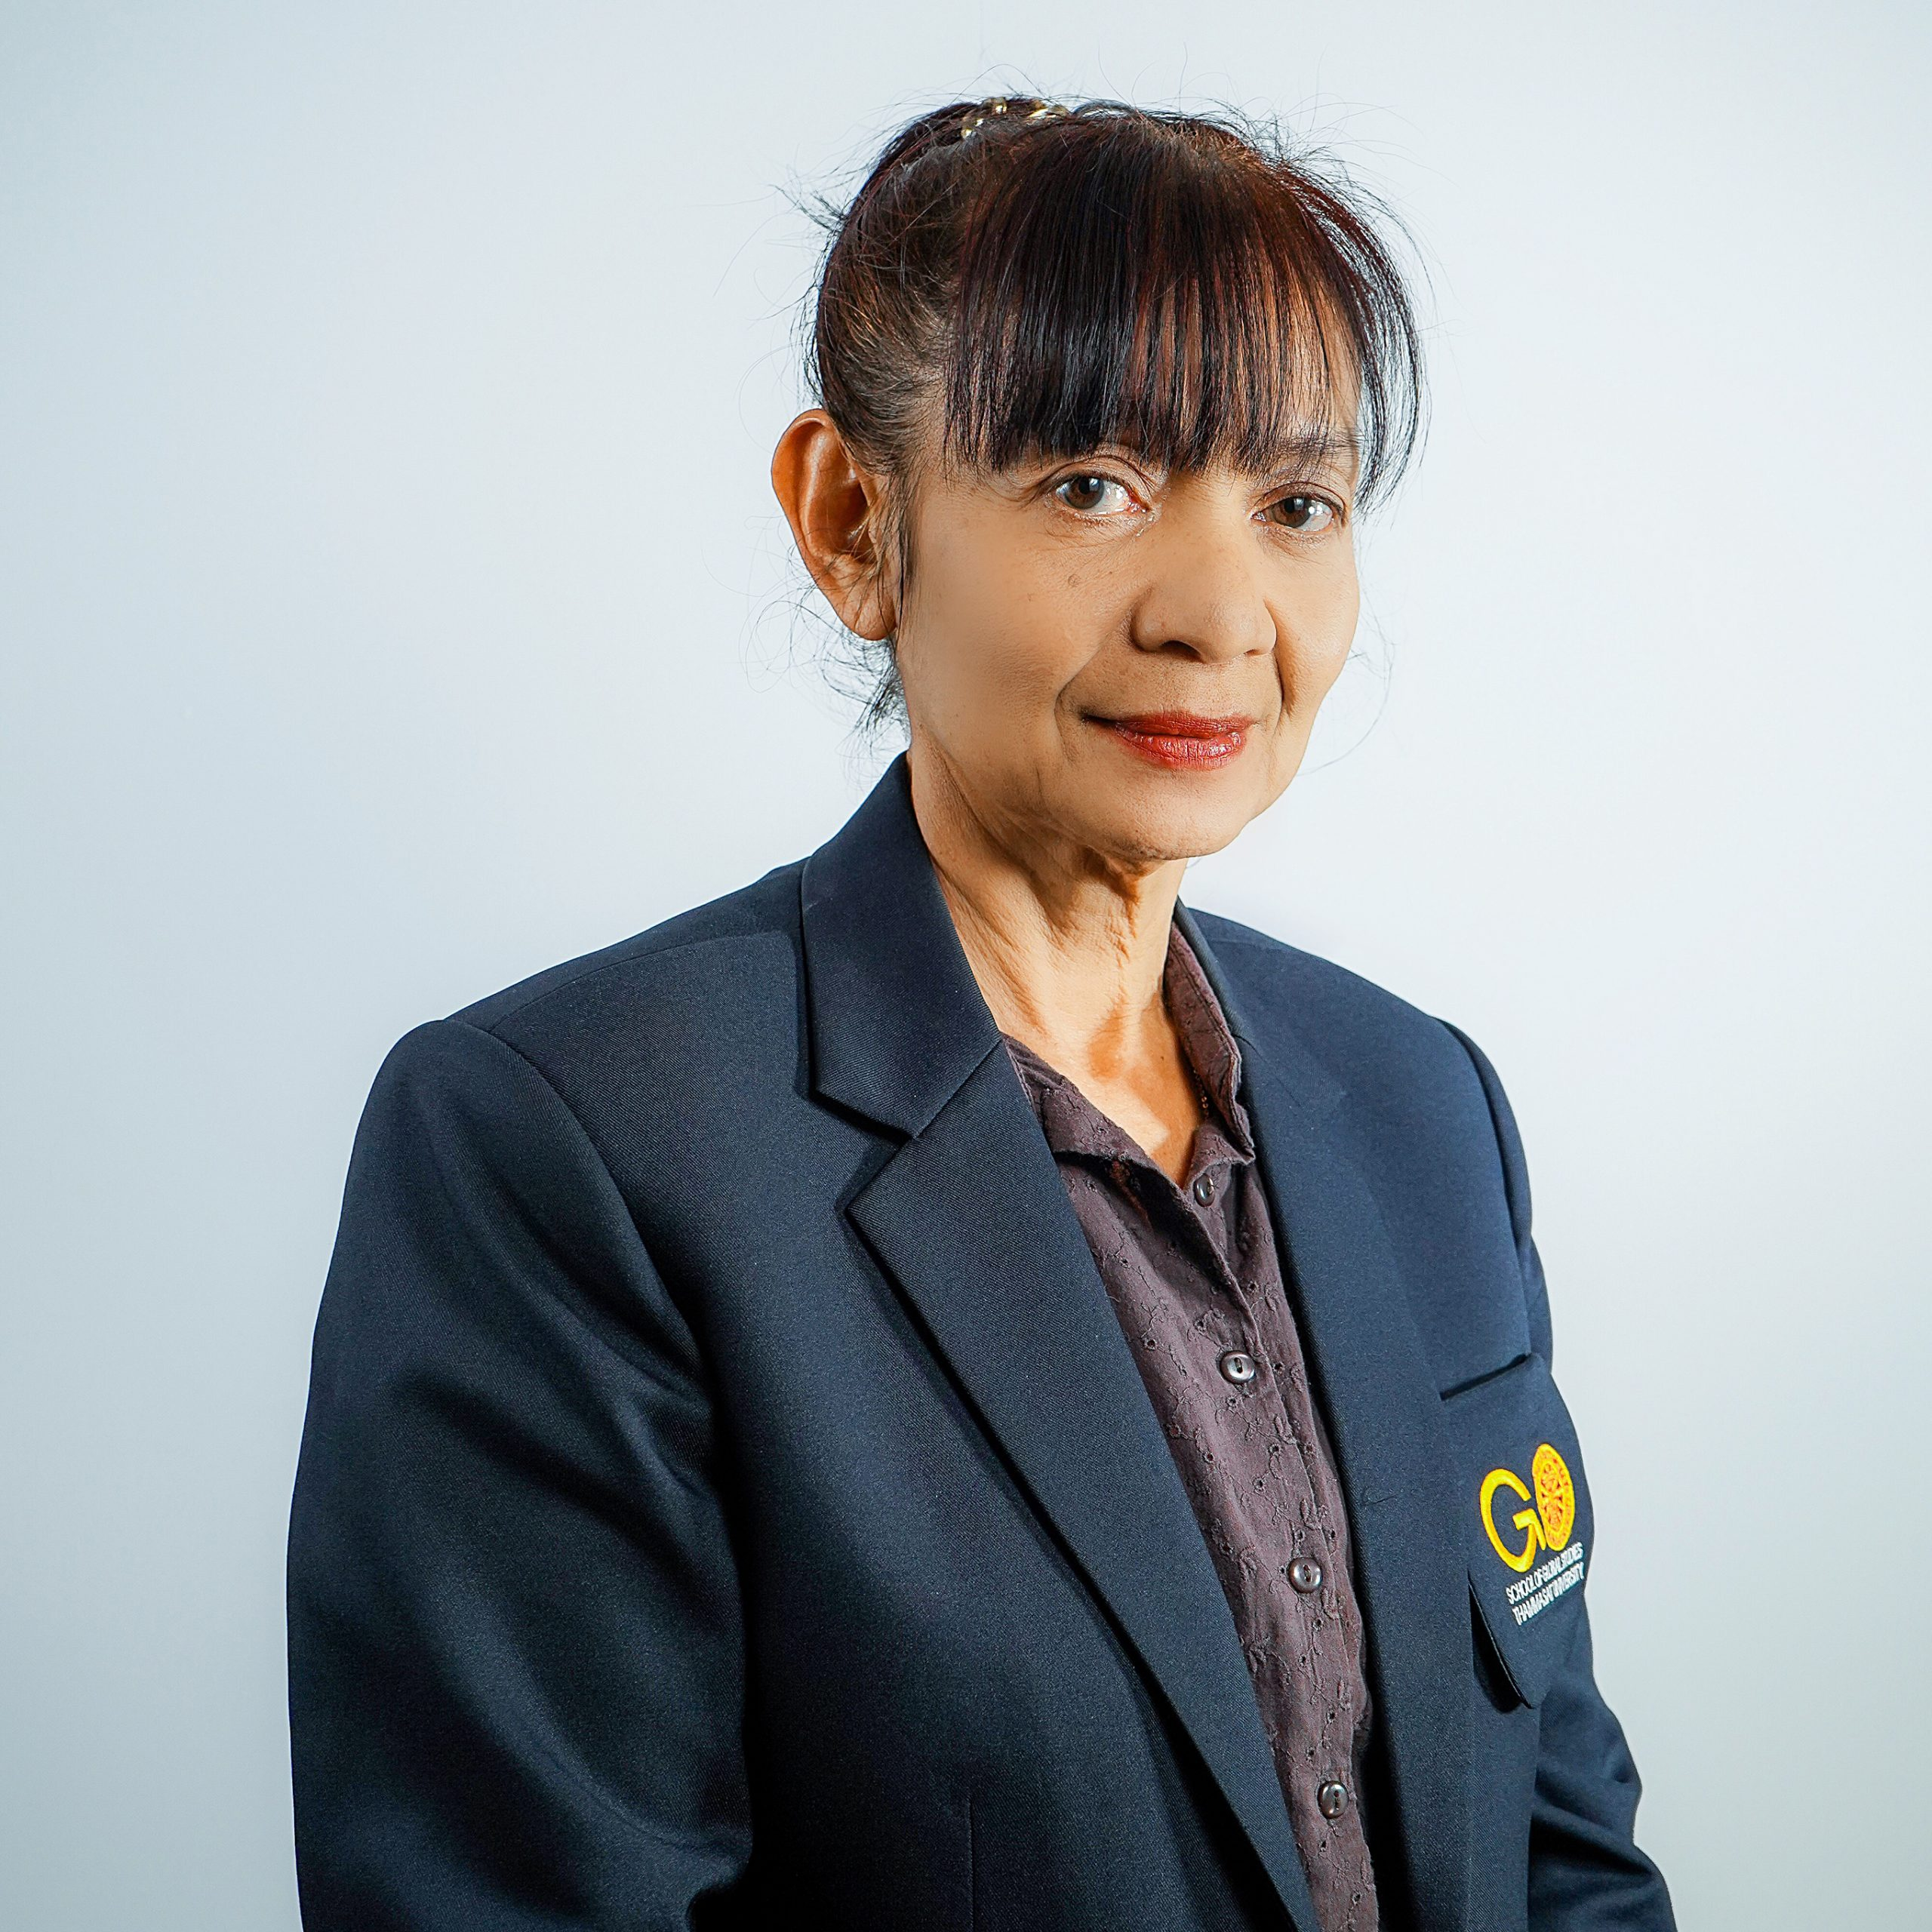 Dr. Wacharin Tanyanont